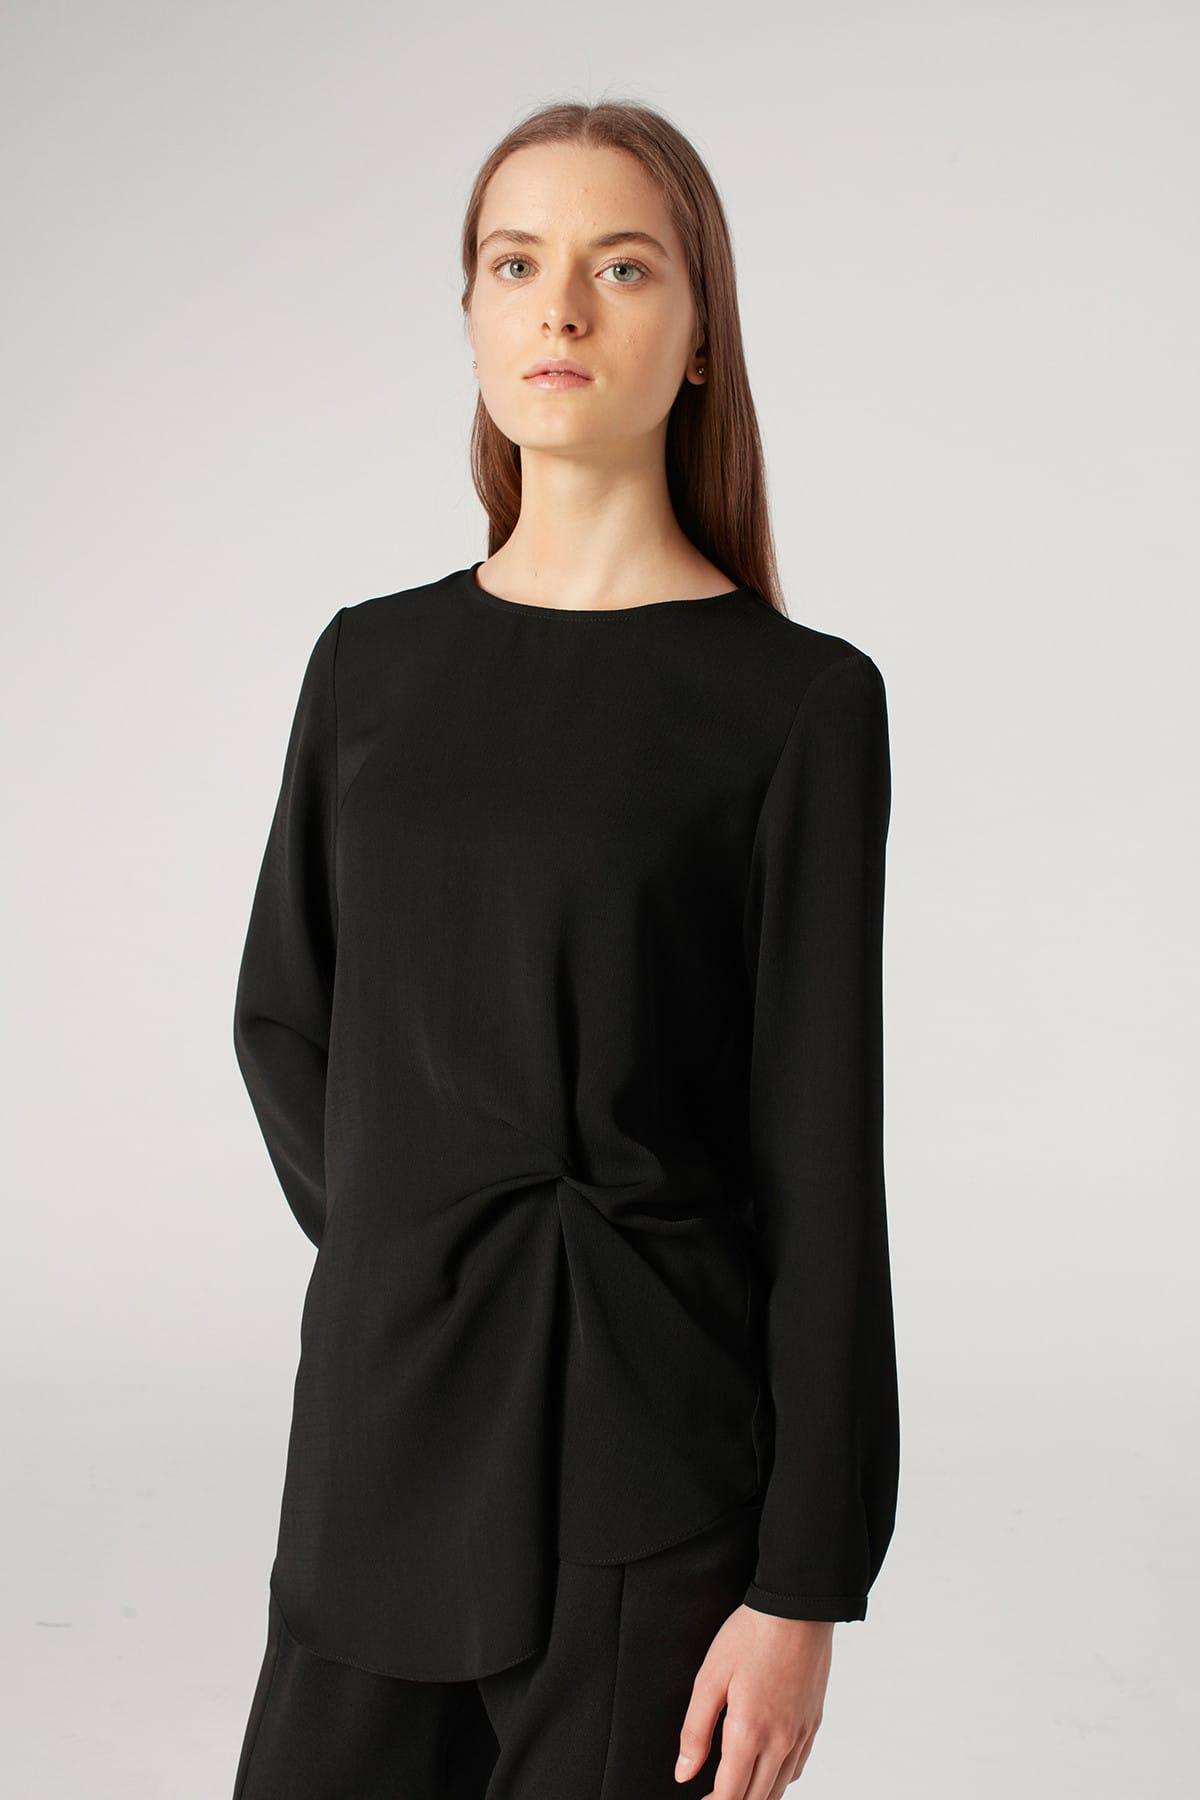 Mizalle Kadın Siyah Düğüm Detaylı Bluz 18KGMZL1012007 1